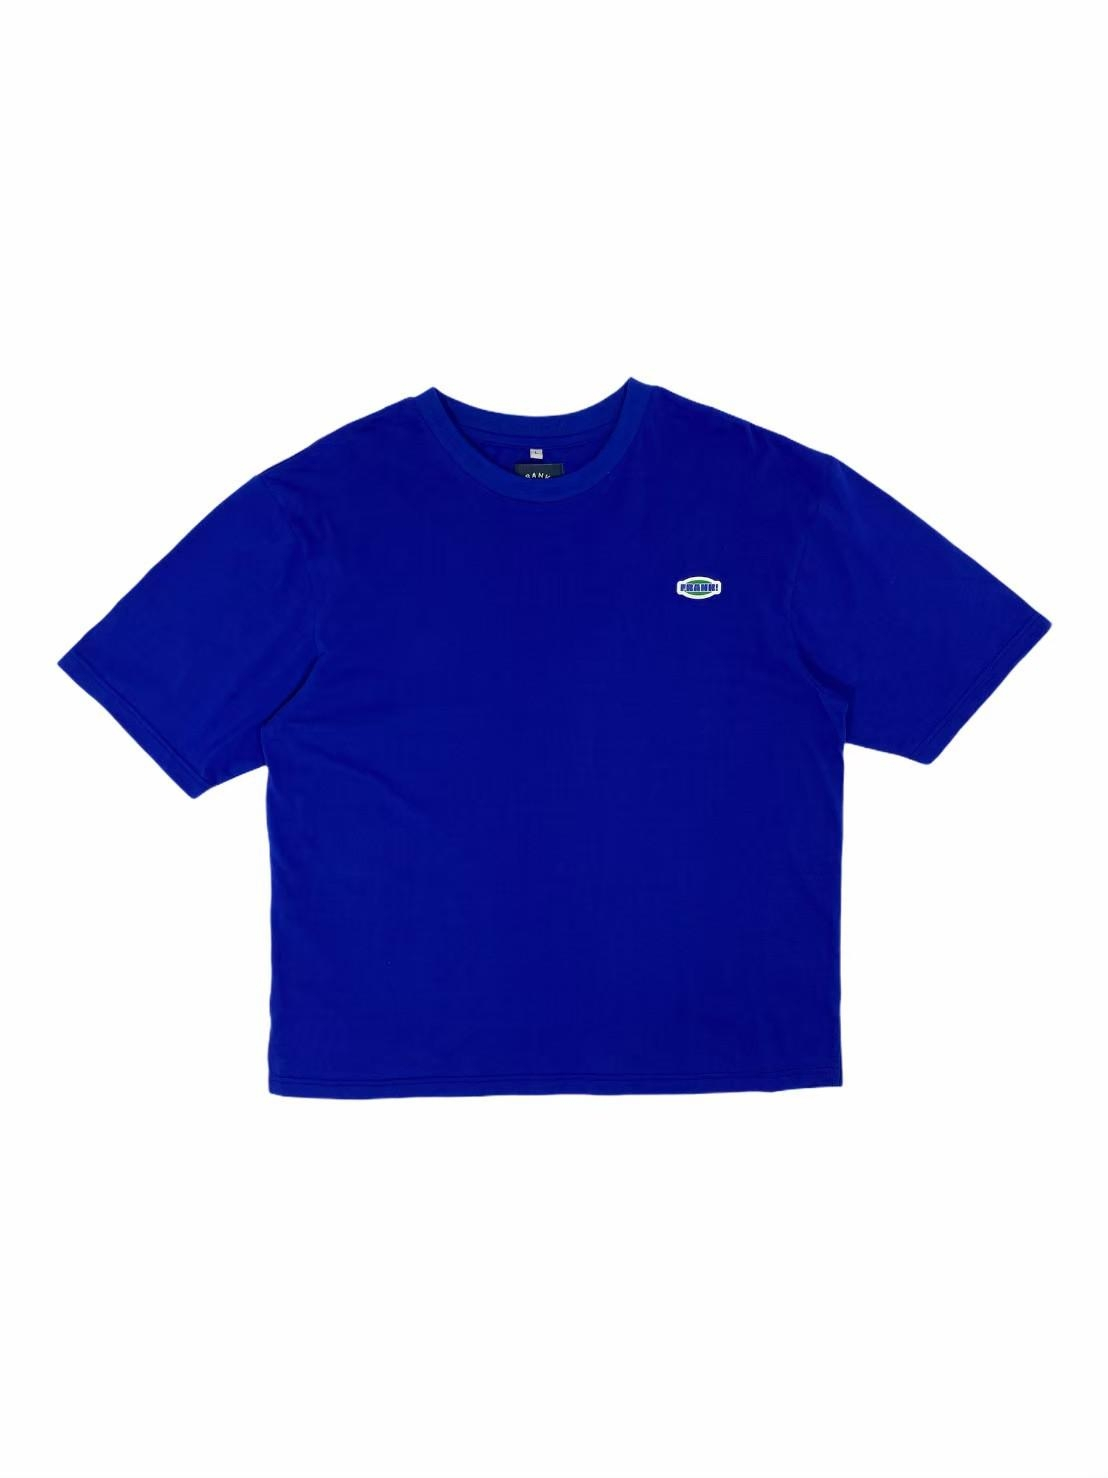 Frank Logo Tee (Blue)